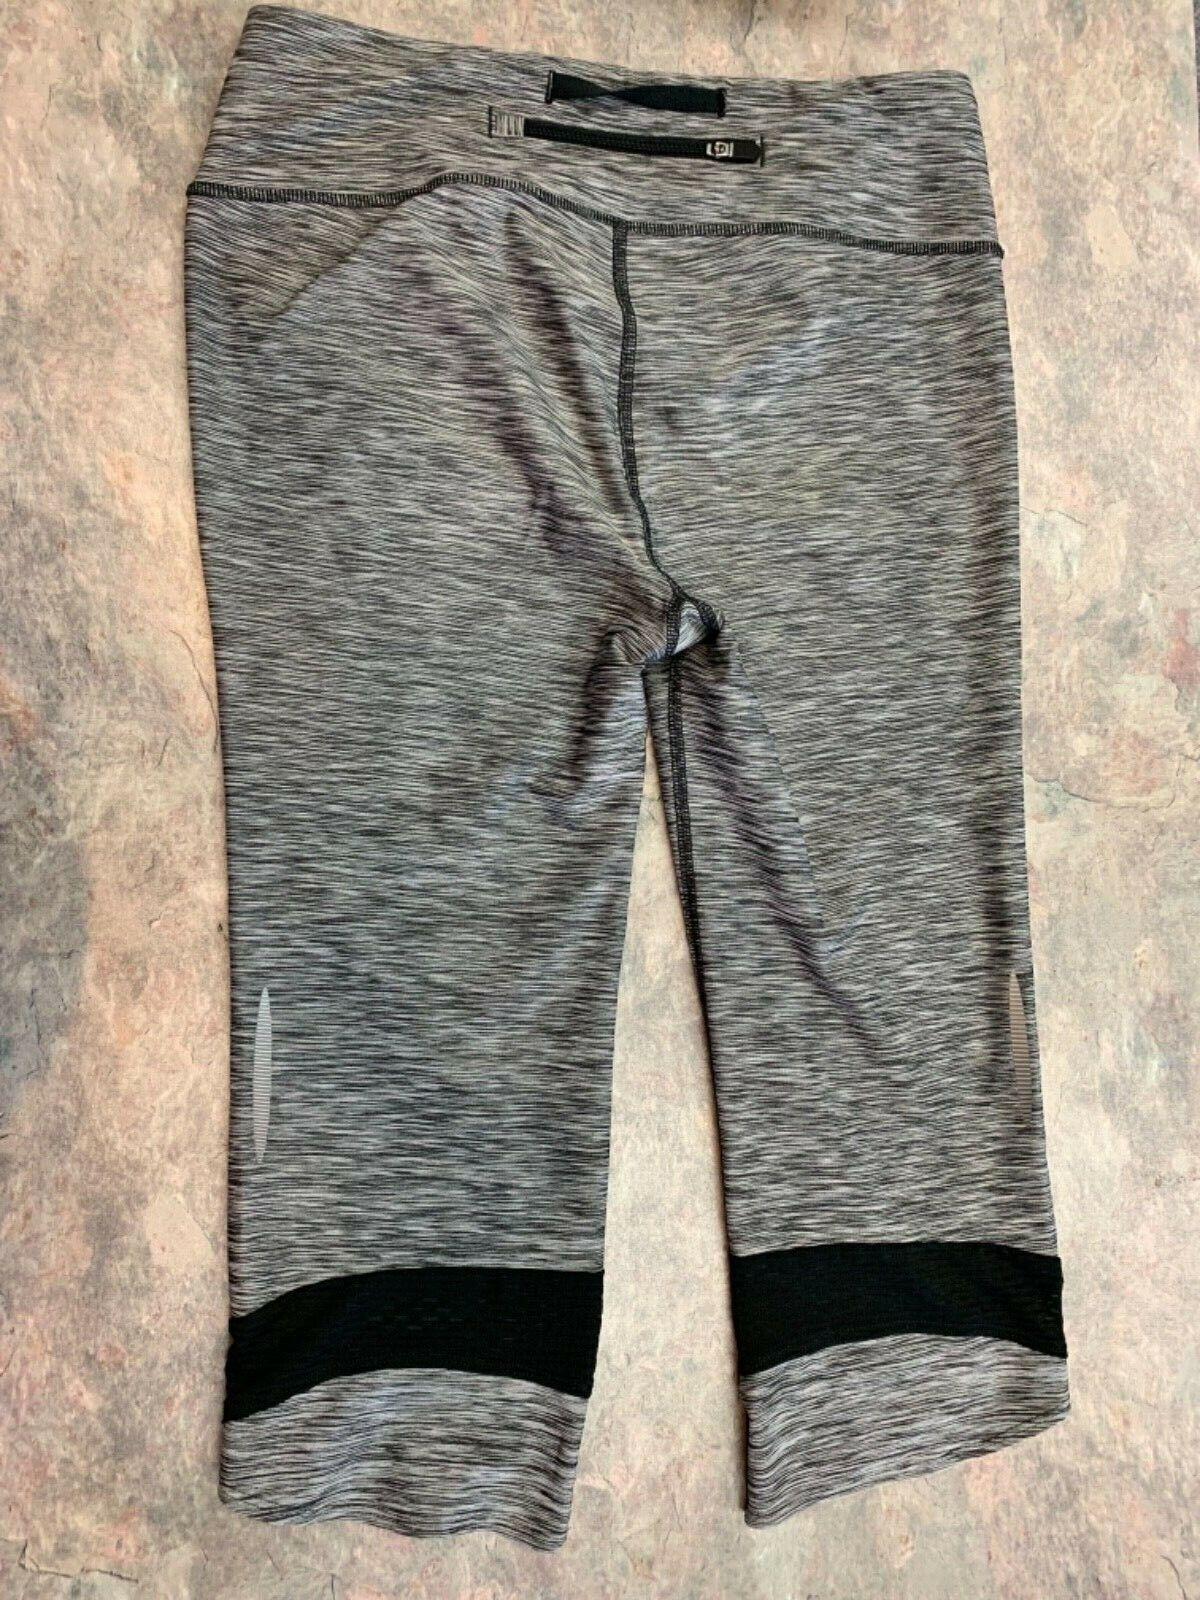 Under Armour Womens Gray/Black leggings capris size 8